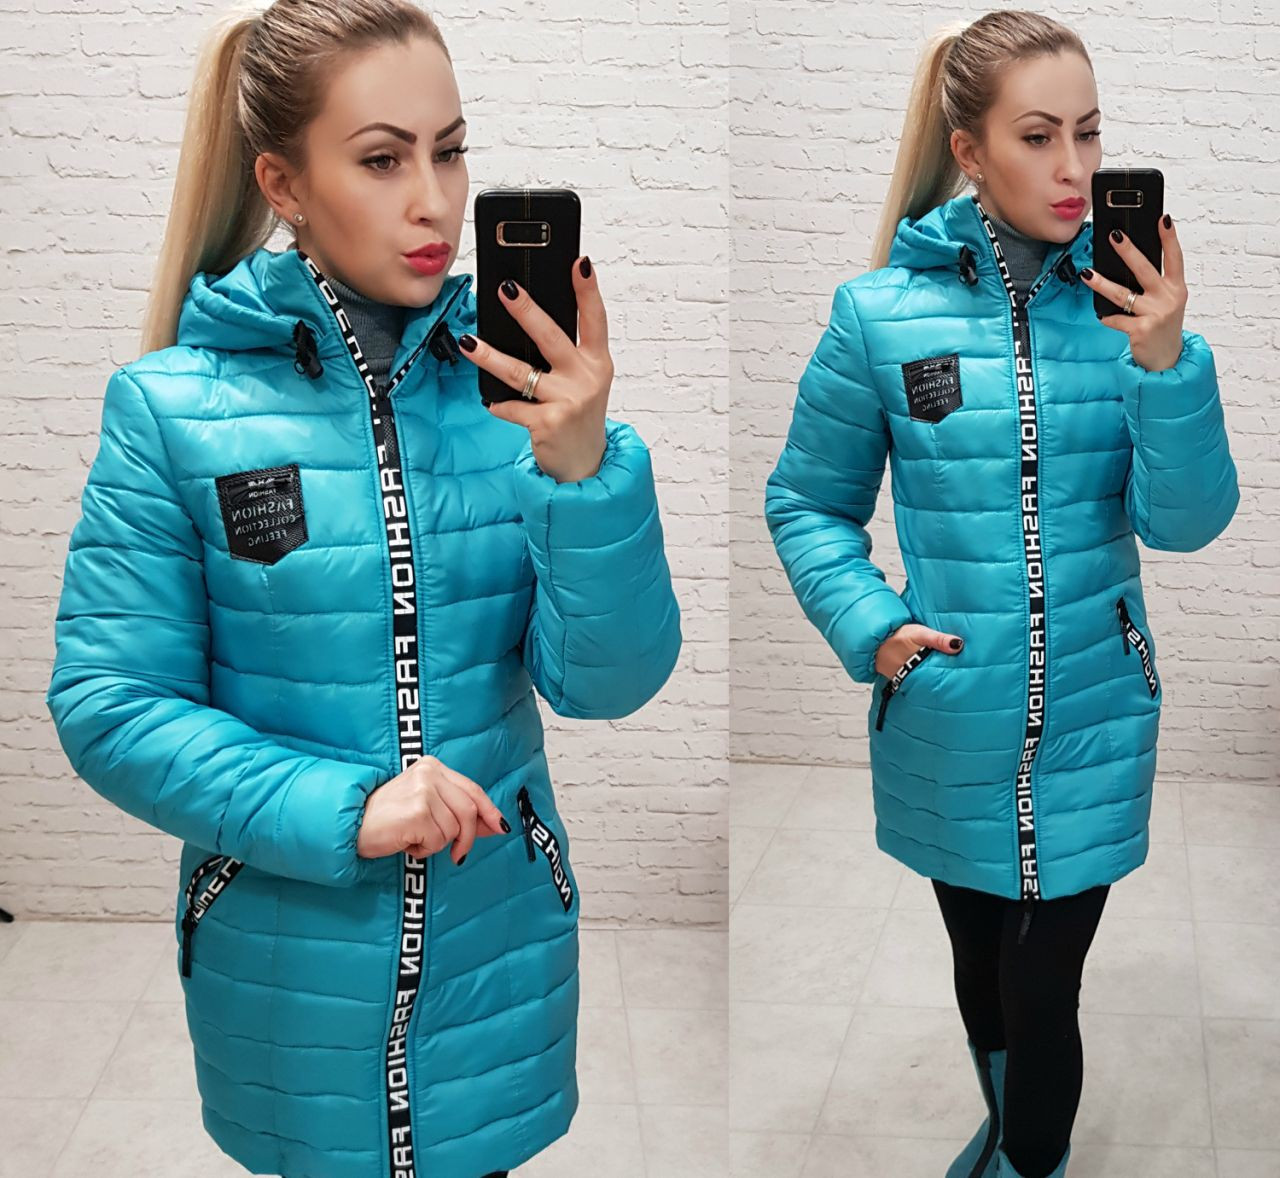 Куртка Зима, модель 212/2, цвет - бирюза глянцевая